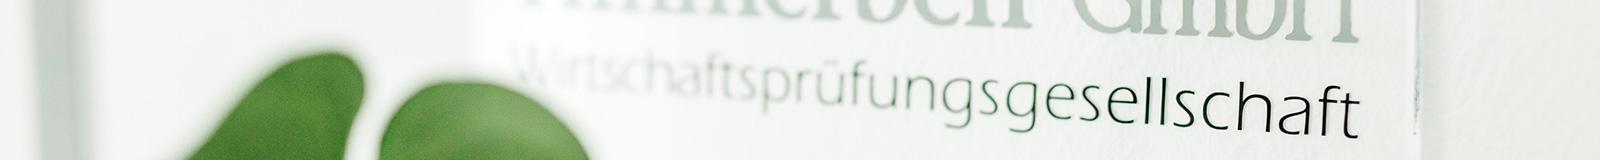 https://timmerbeil-wp.de/uploads/images/headerimages/Leistungen-wirtschaftspruefung.jpg